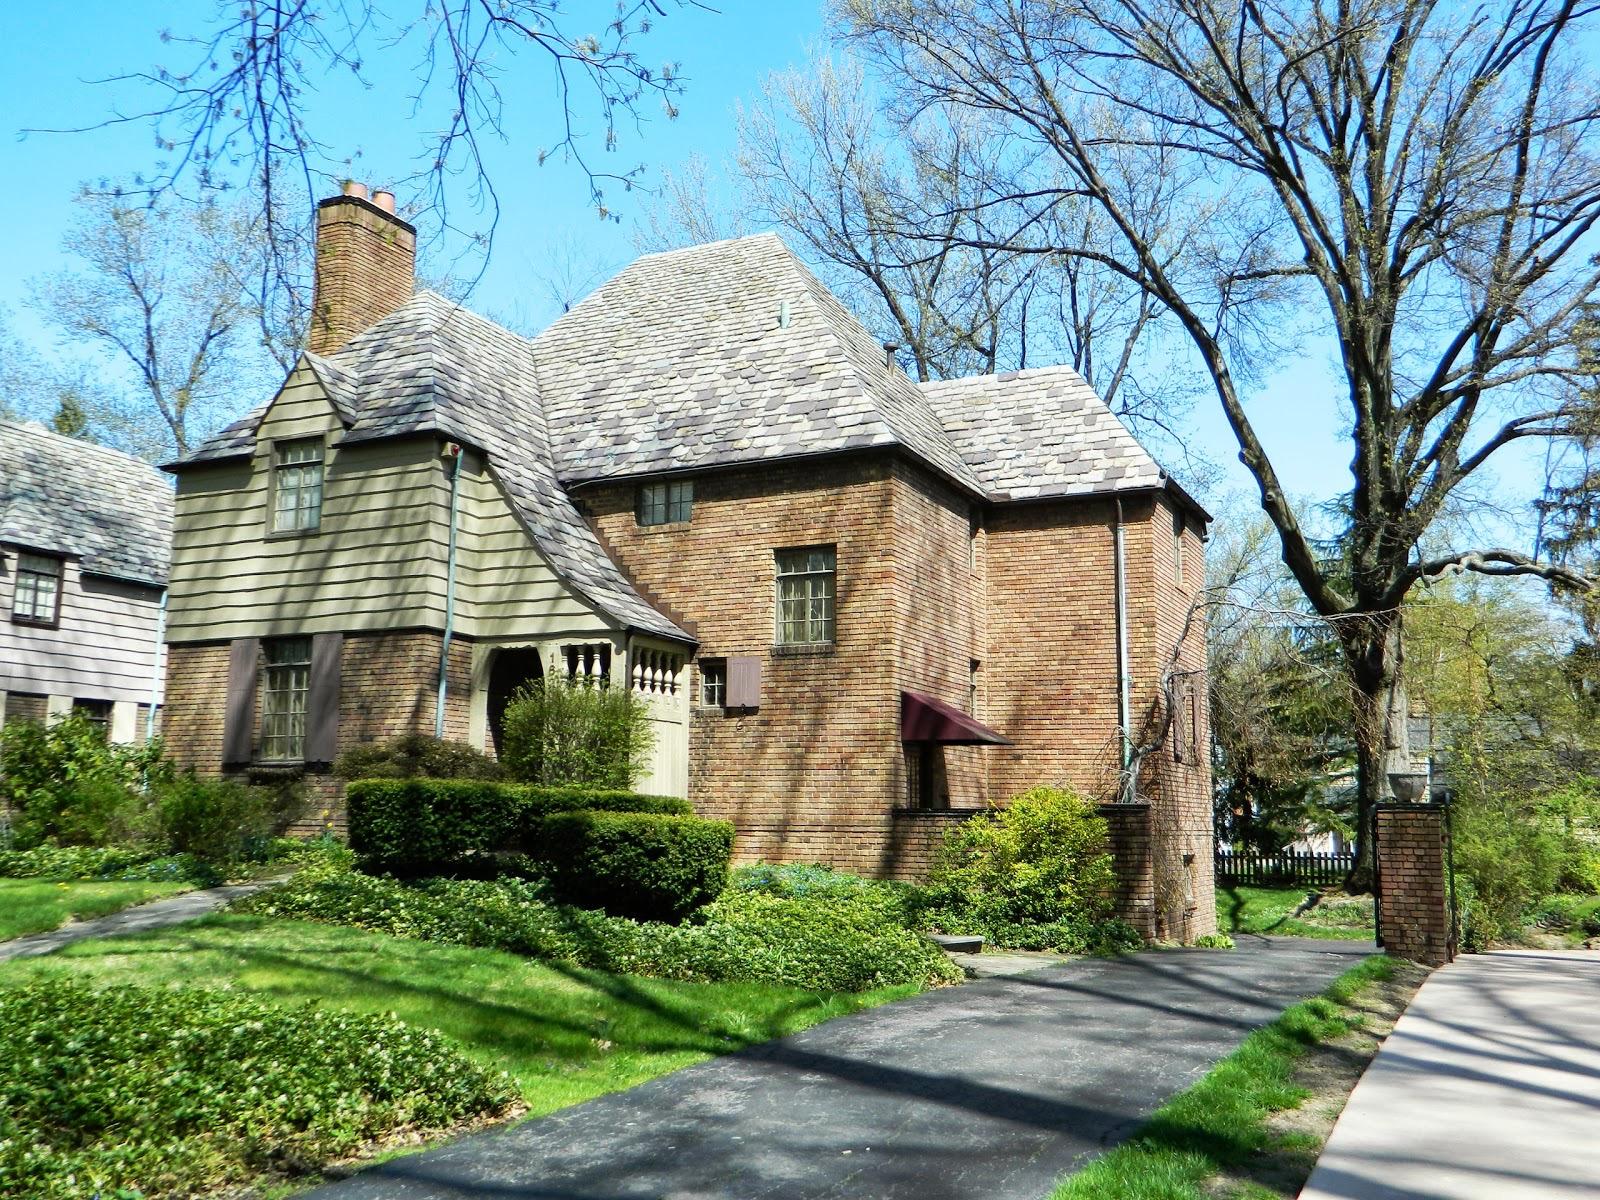 20130430049 E Cleveland Forest Hills 16201 Brewster.jpg